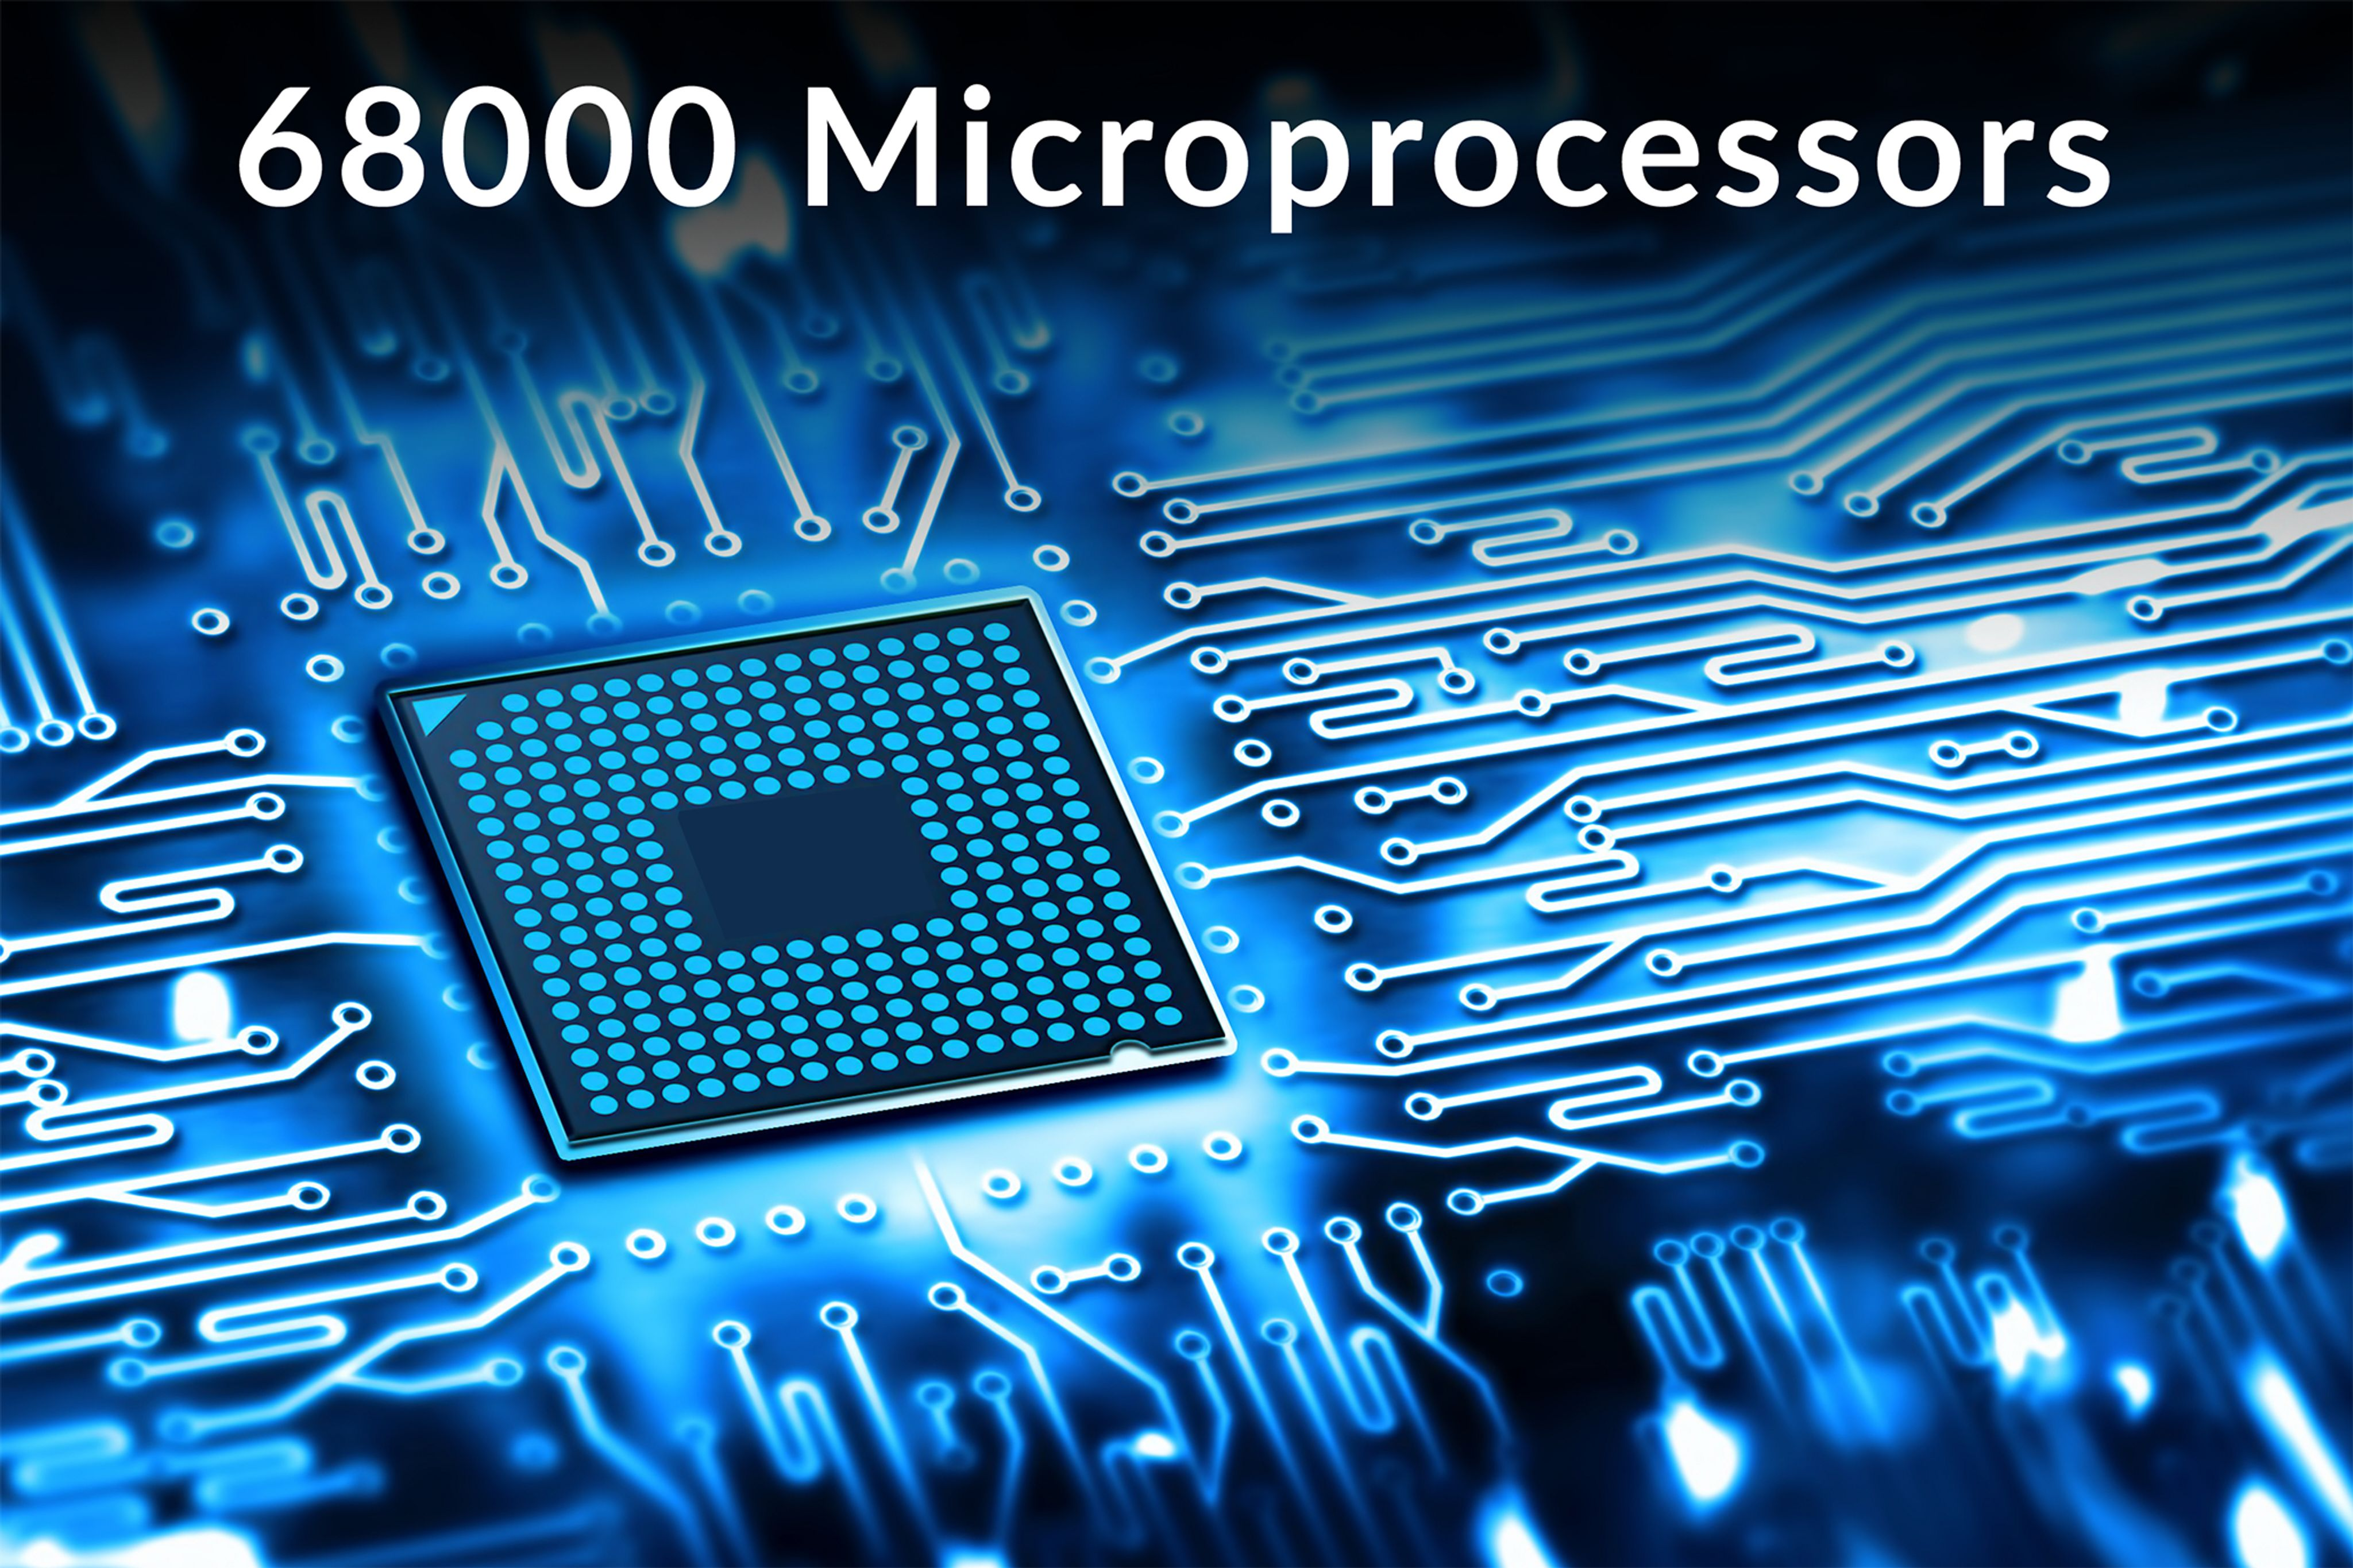 MC68000_External%20Email_NOV20%20version%202